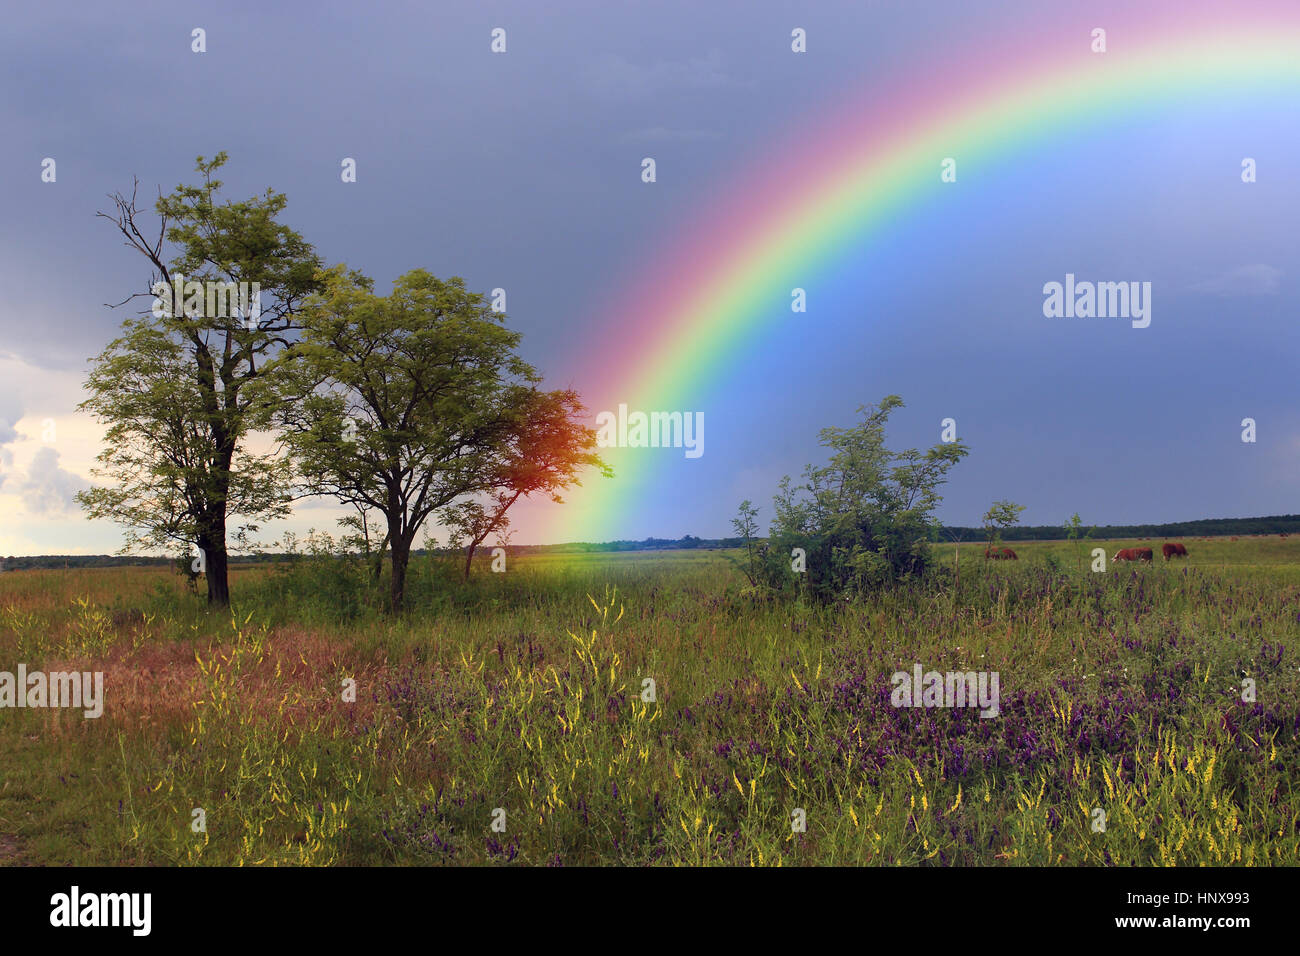 Rainbow over farmland - Stock Image